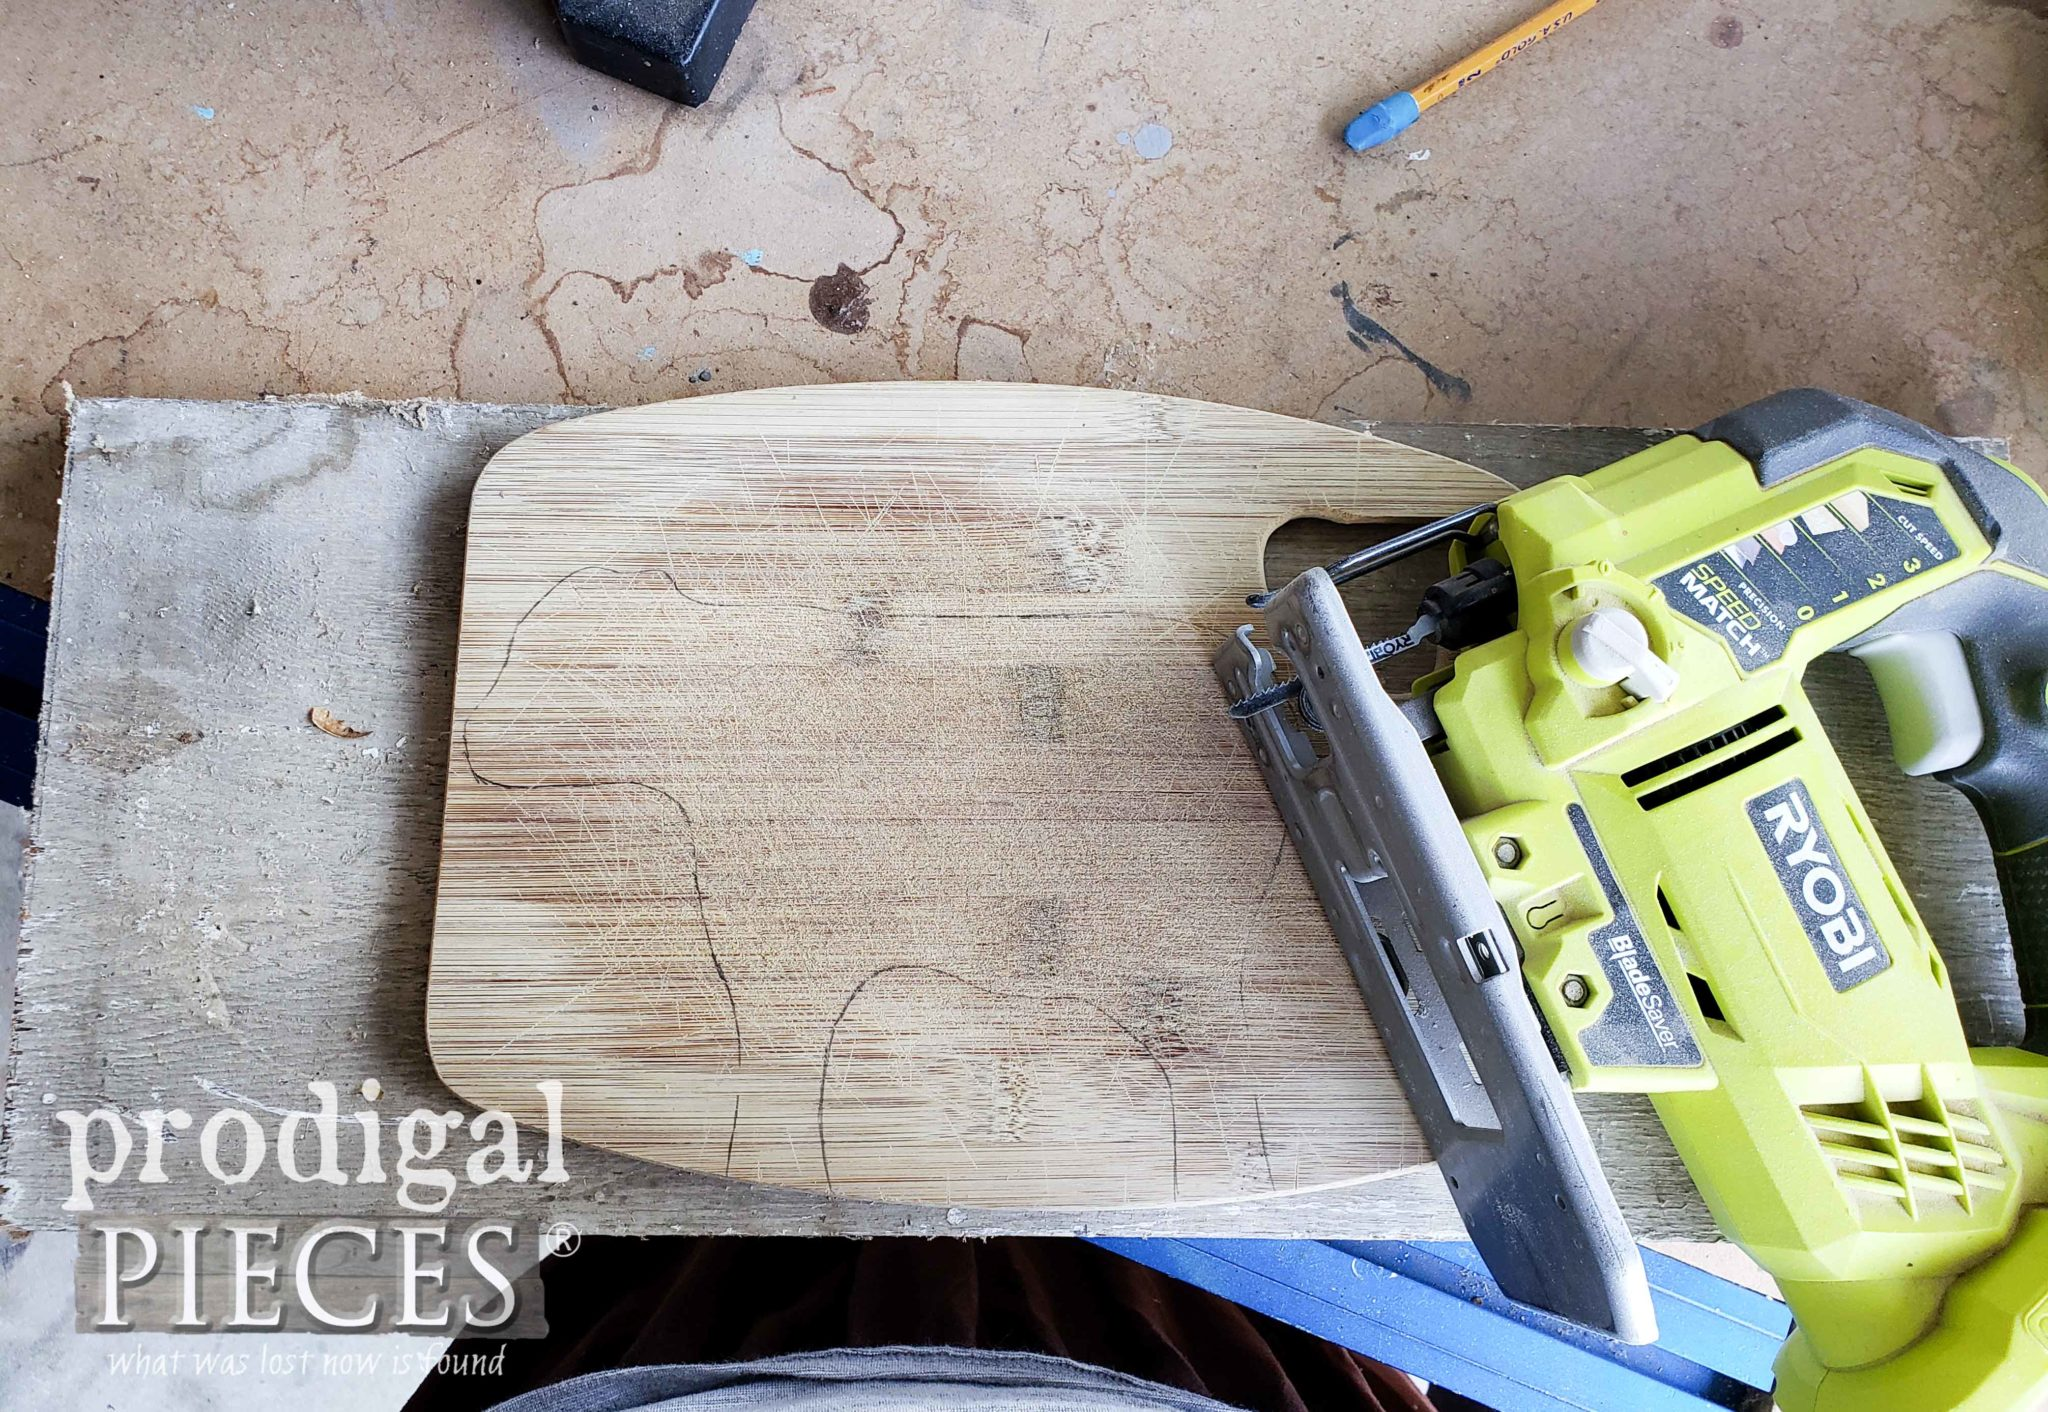 Ryobi Jigsaw to Cut Wooden Cutting Board by Prodigal Pieces | prodigalpieces.com